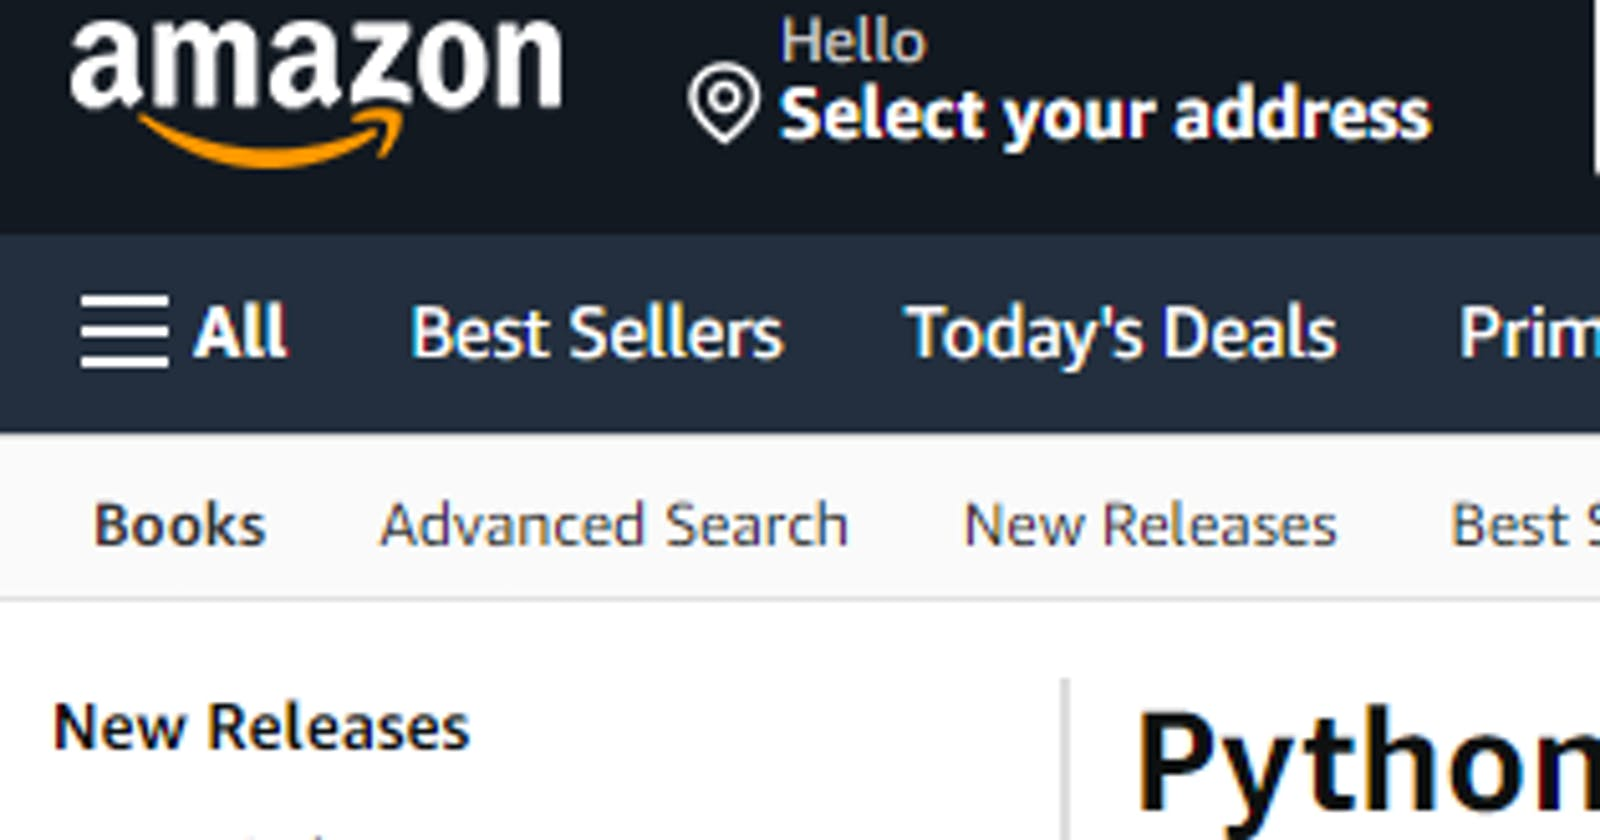 Querying the Amazon Product Data API using Python